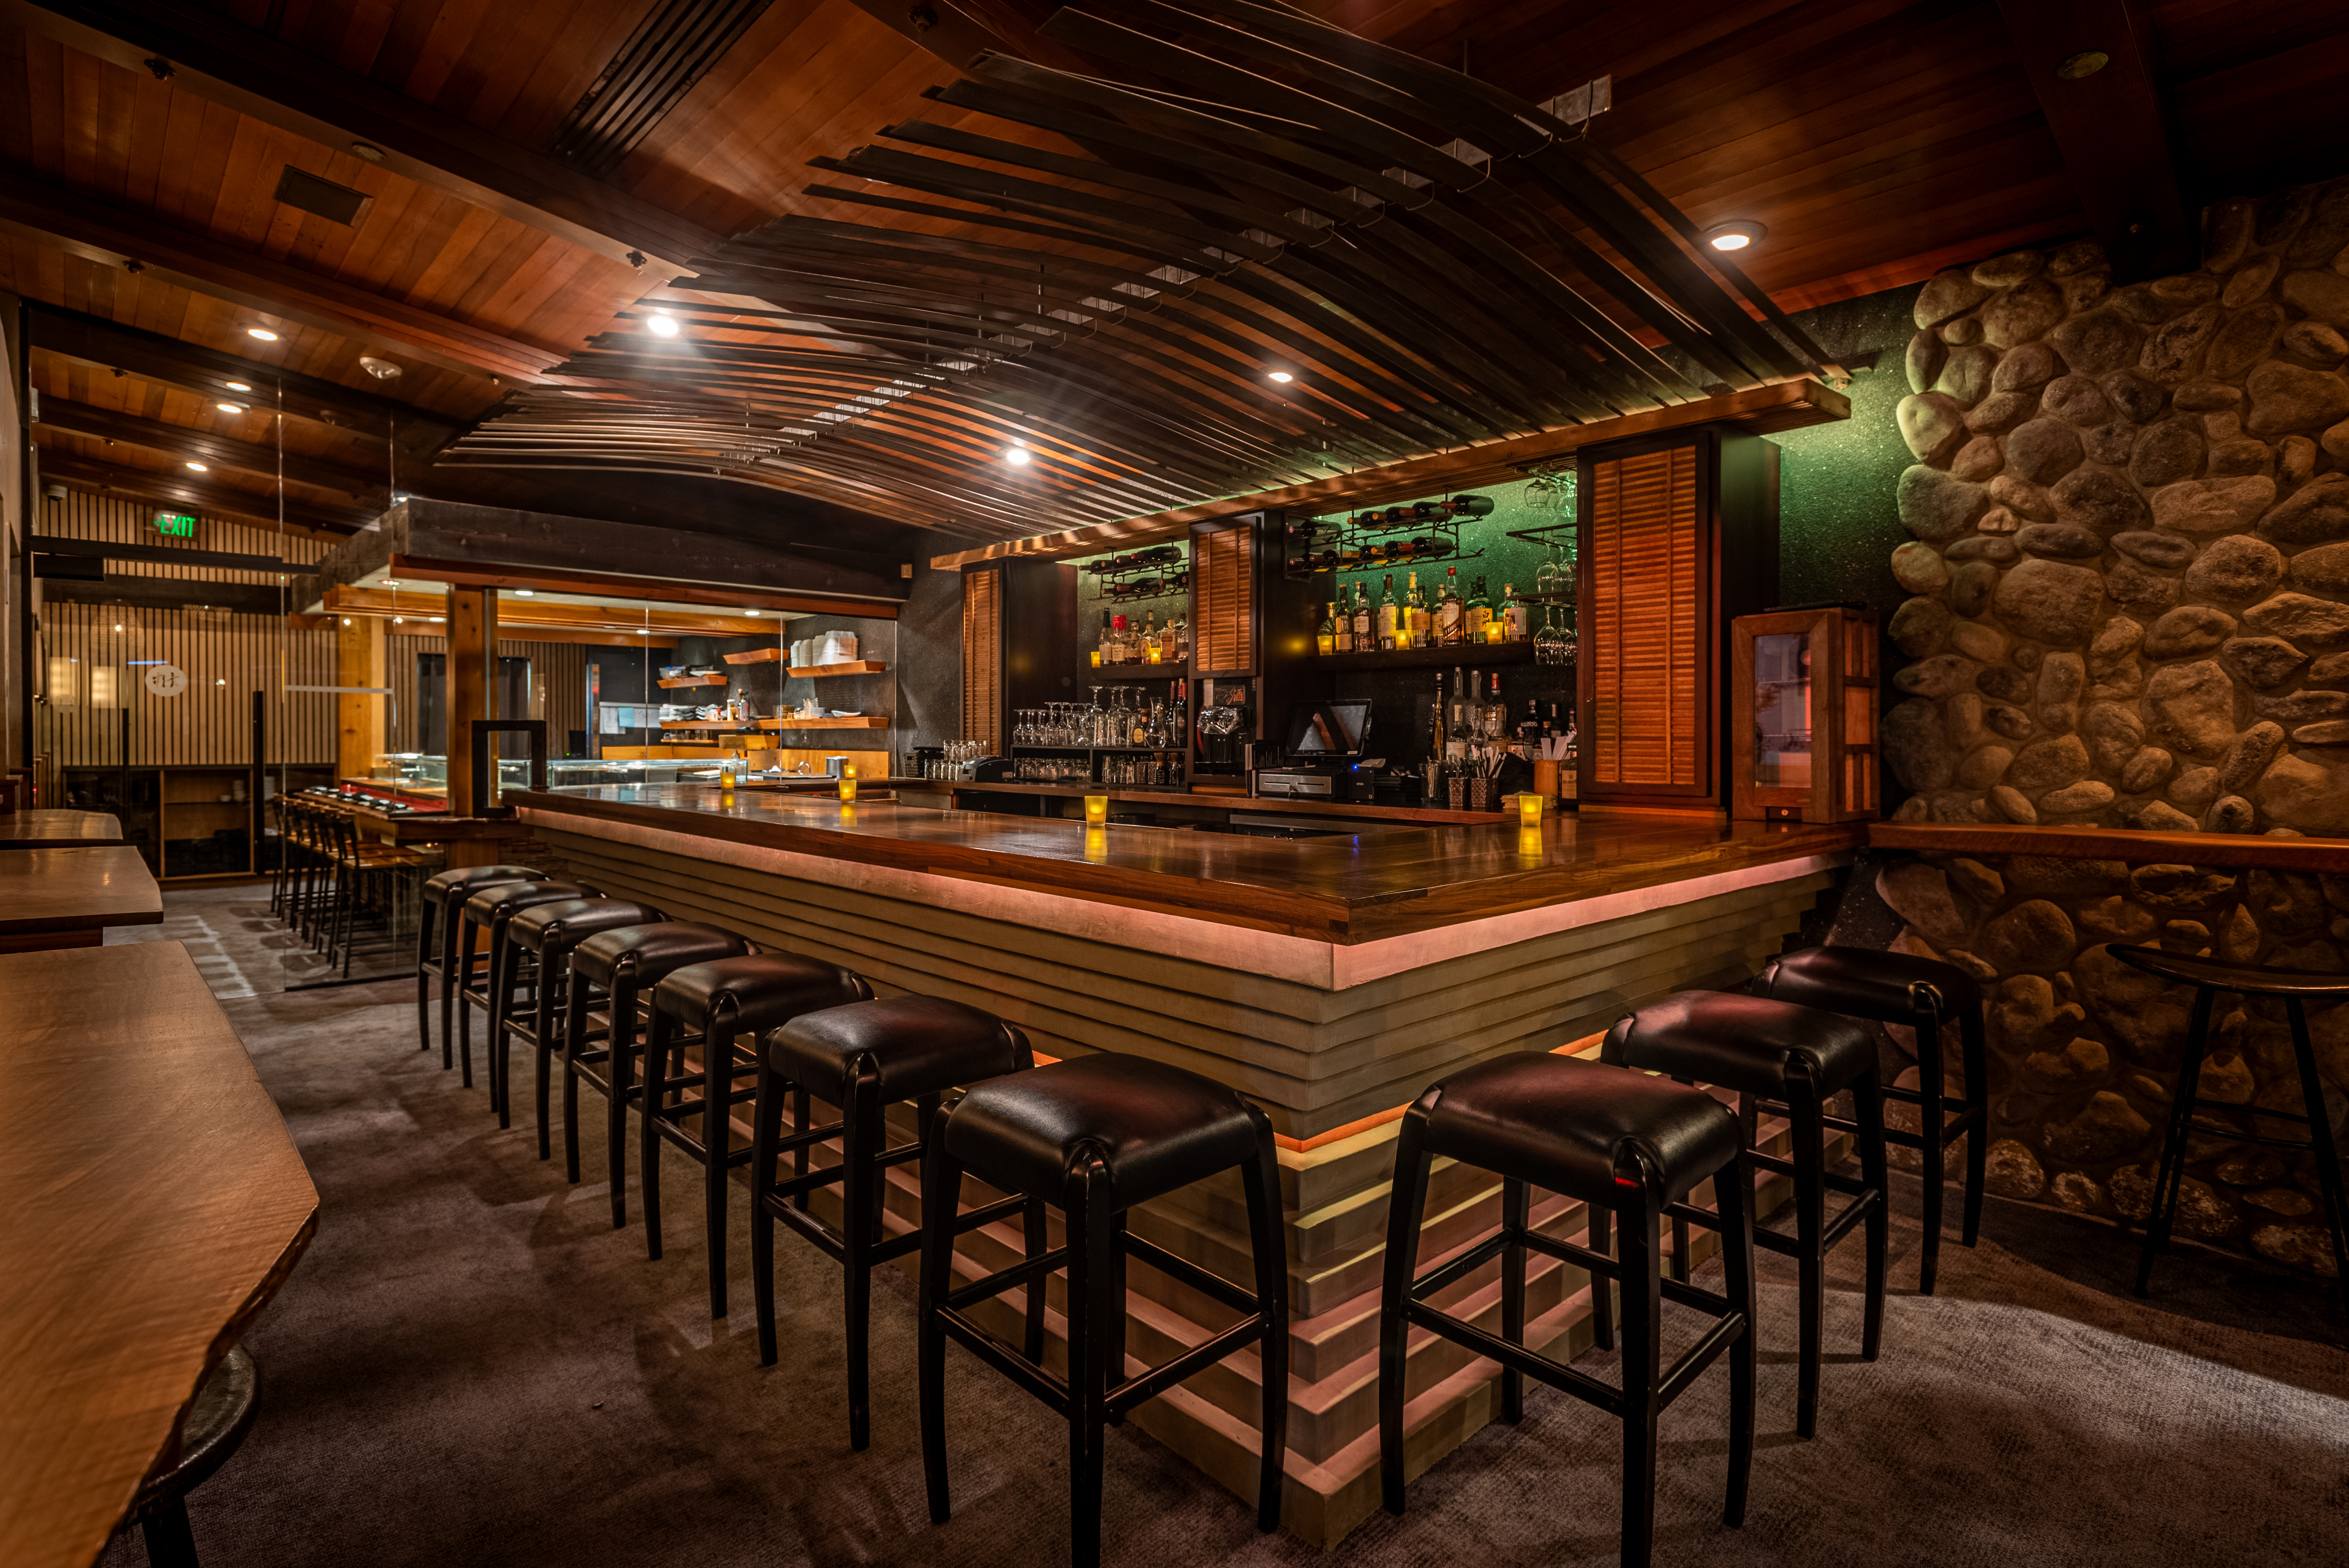 The dining area and bar at Sushi Roku Santa Monica